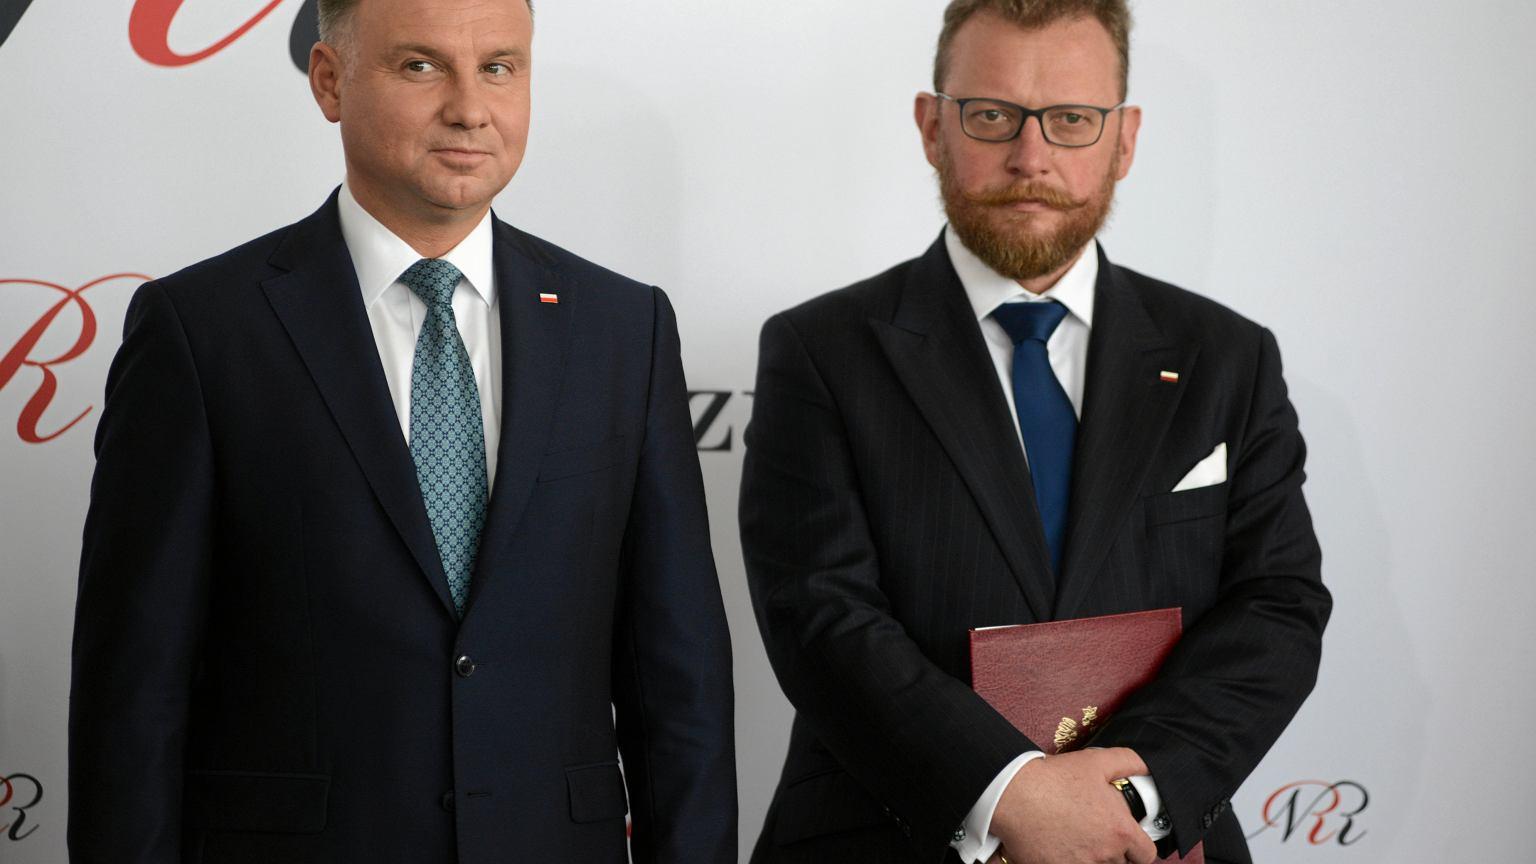 https://bi.im-g.pl/im/1a/8d/18/z25745946IER,Andrzej-Duda-i-Lukasz-Szumowski.jpg